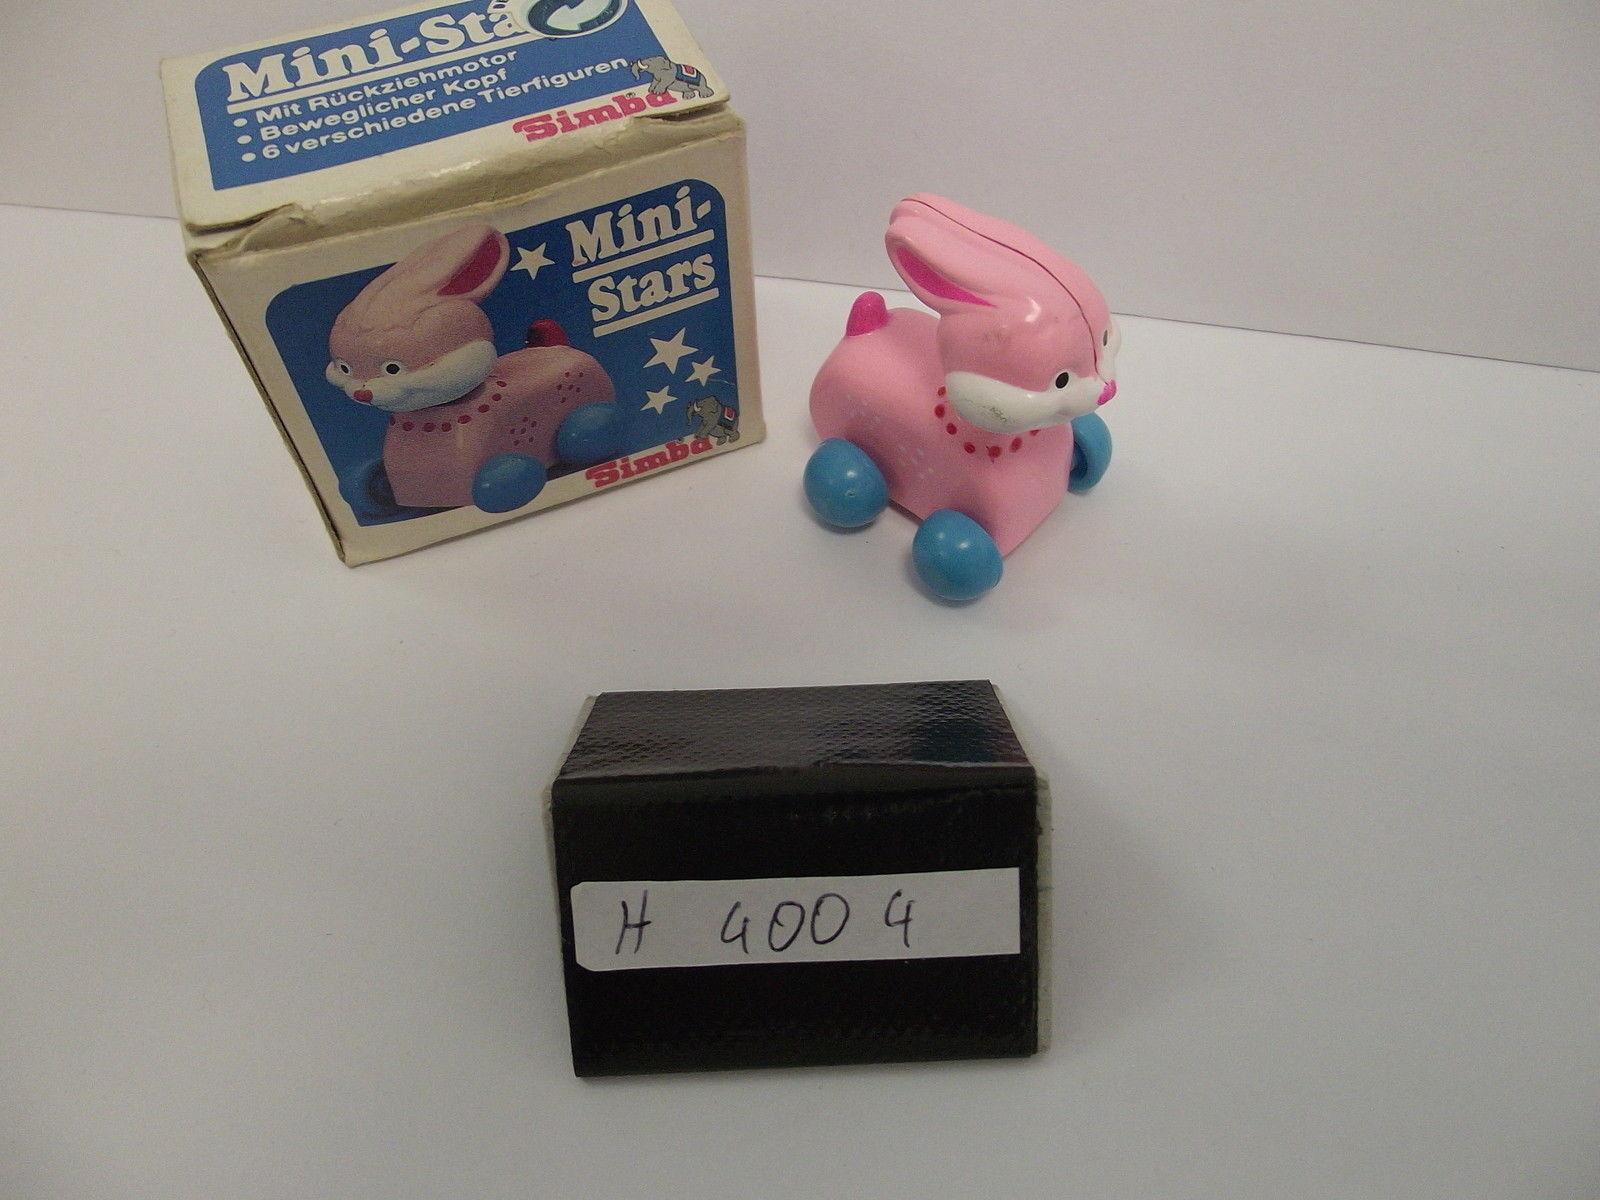 Simba Mini Stars Art 361 3660 Pinker Hase